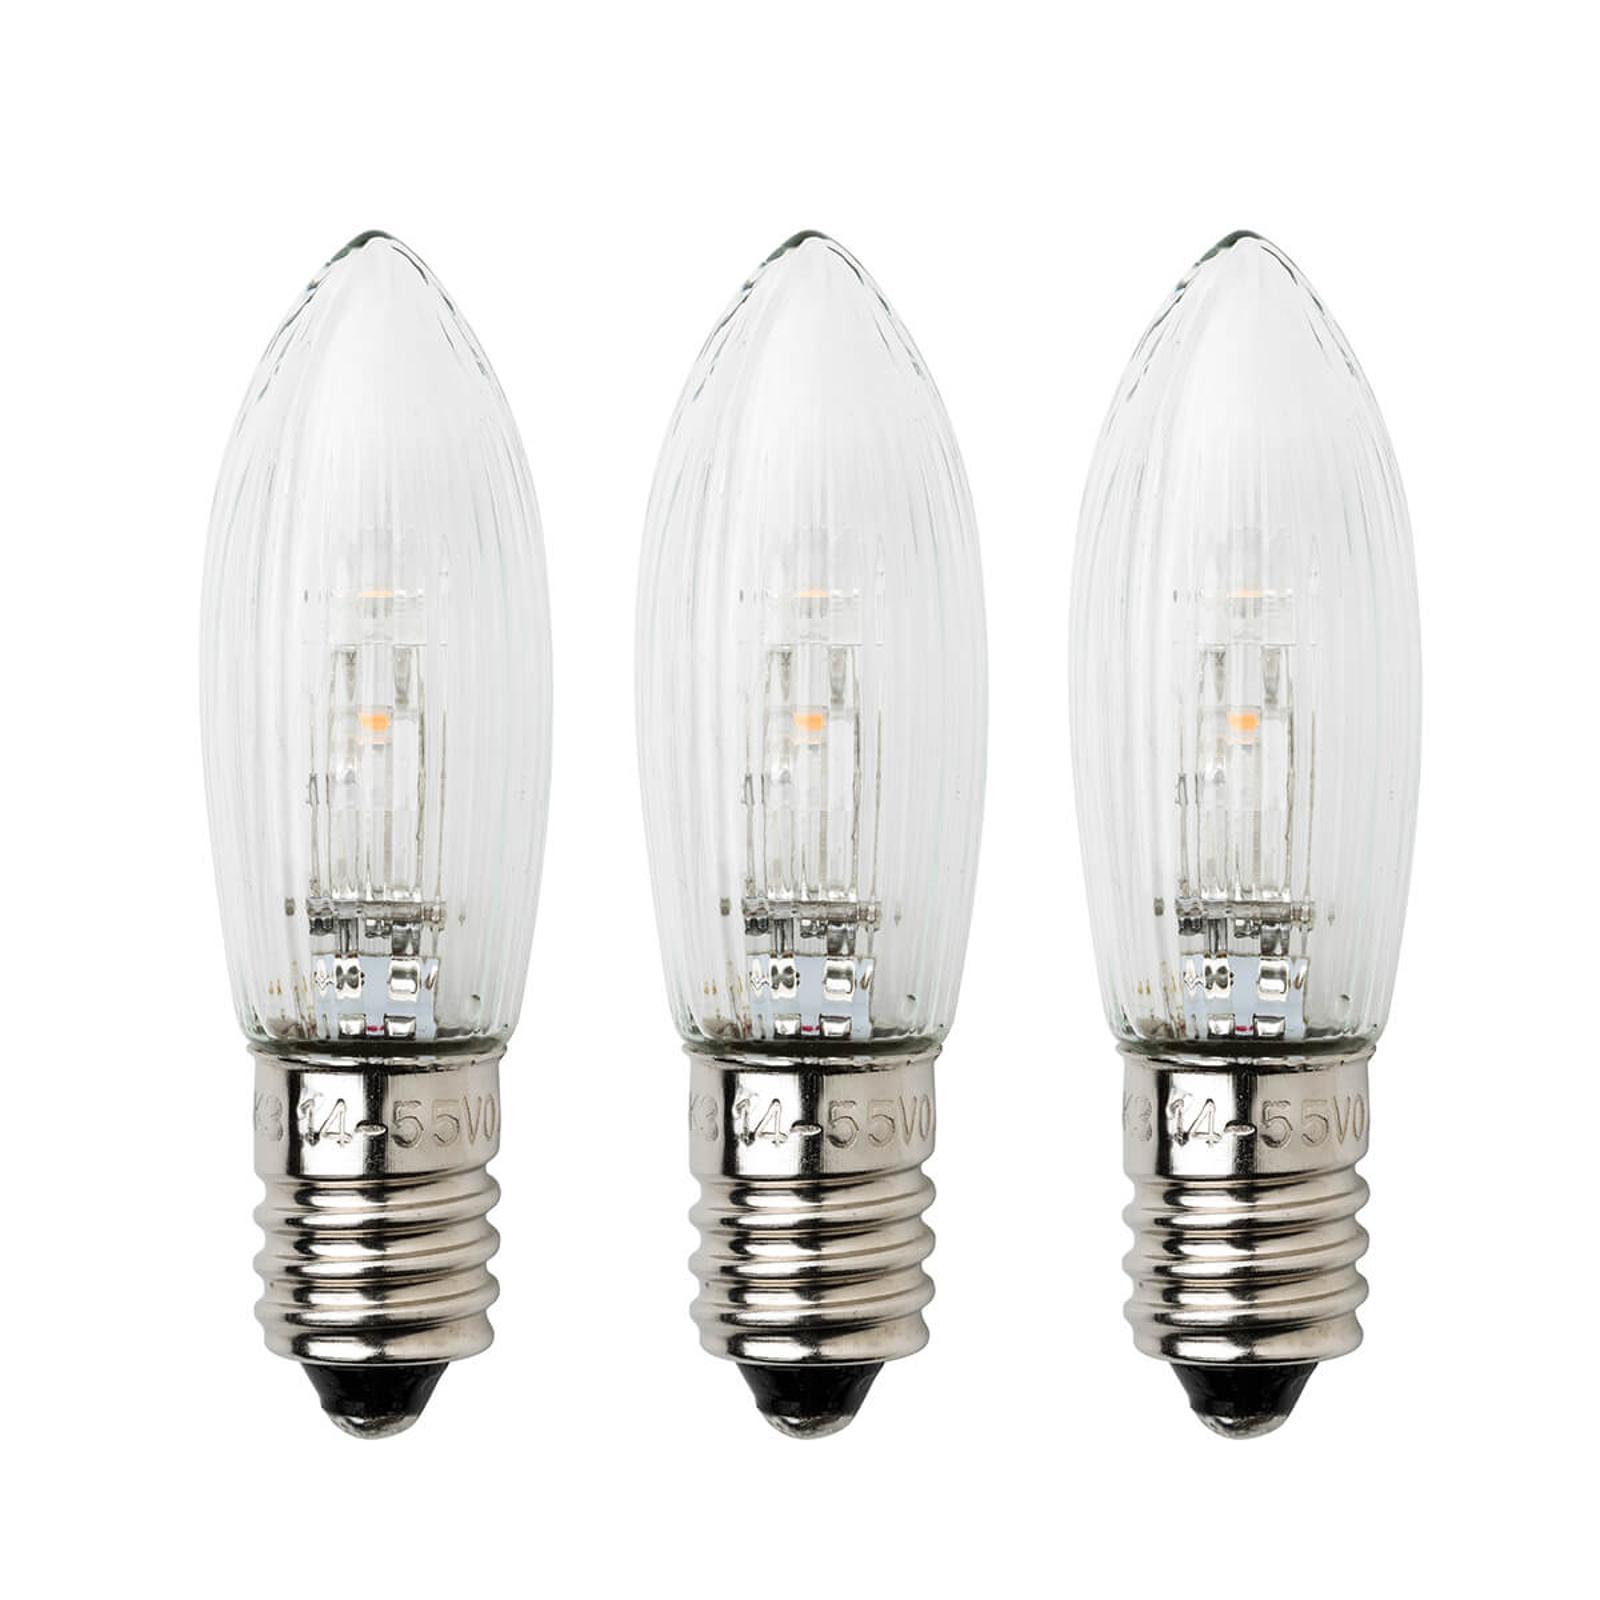 Lampka zast. E10, 0,3W 24V, 3 szt. w opakowaniu